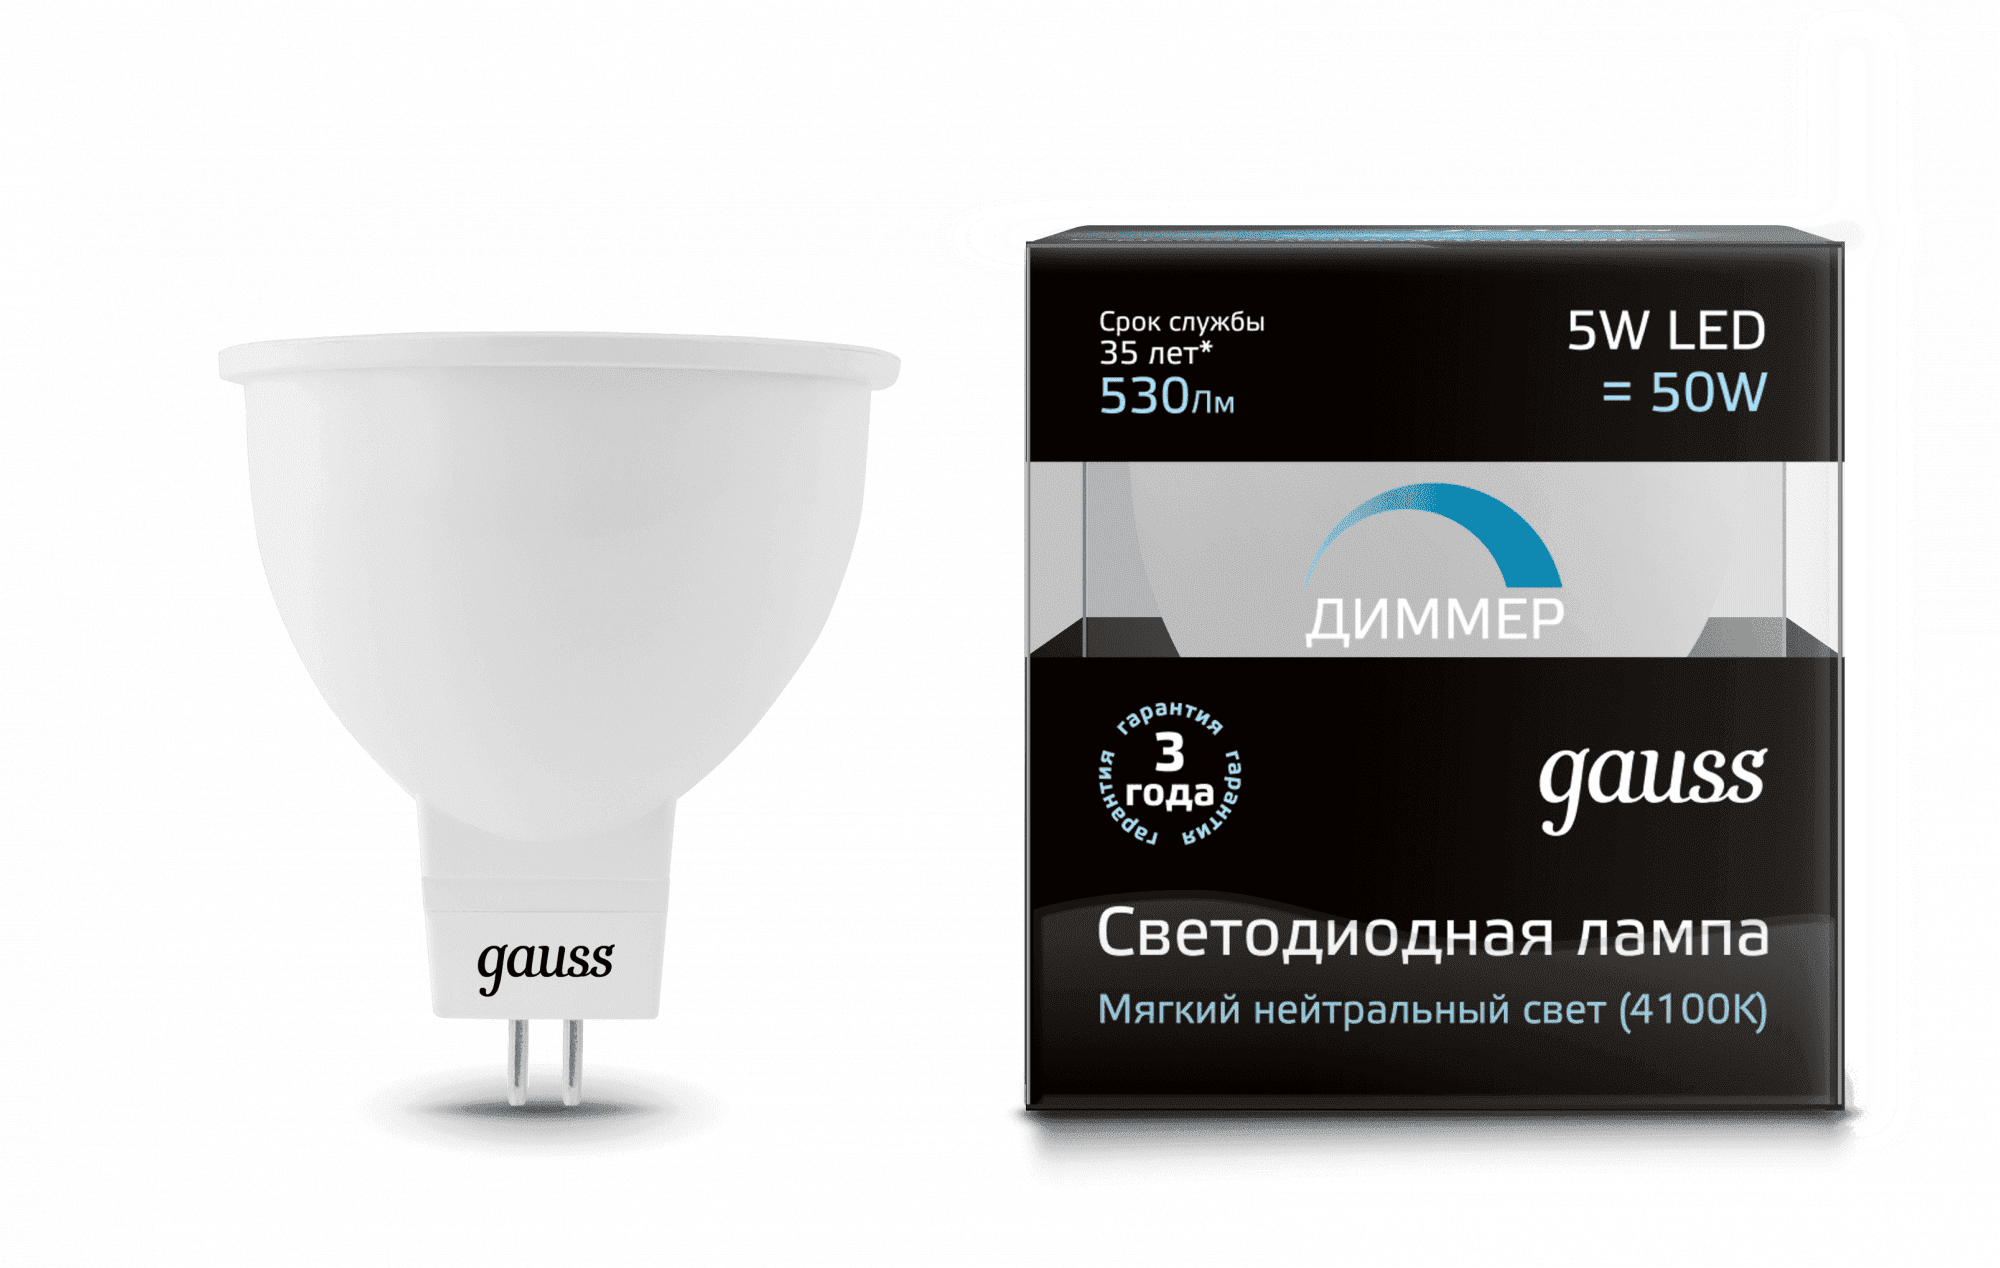 Gauss LED MR16 GU5.3-dim 5W 4100K диммируемая арт. 101505205-D